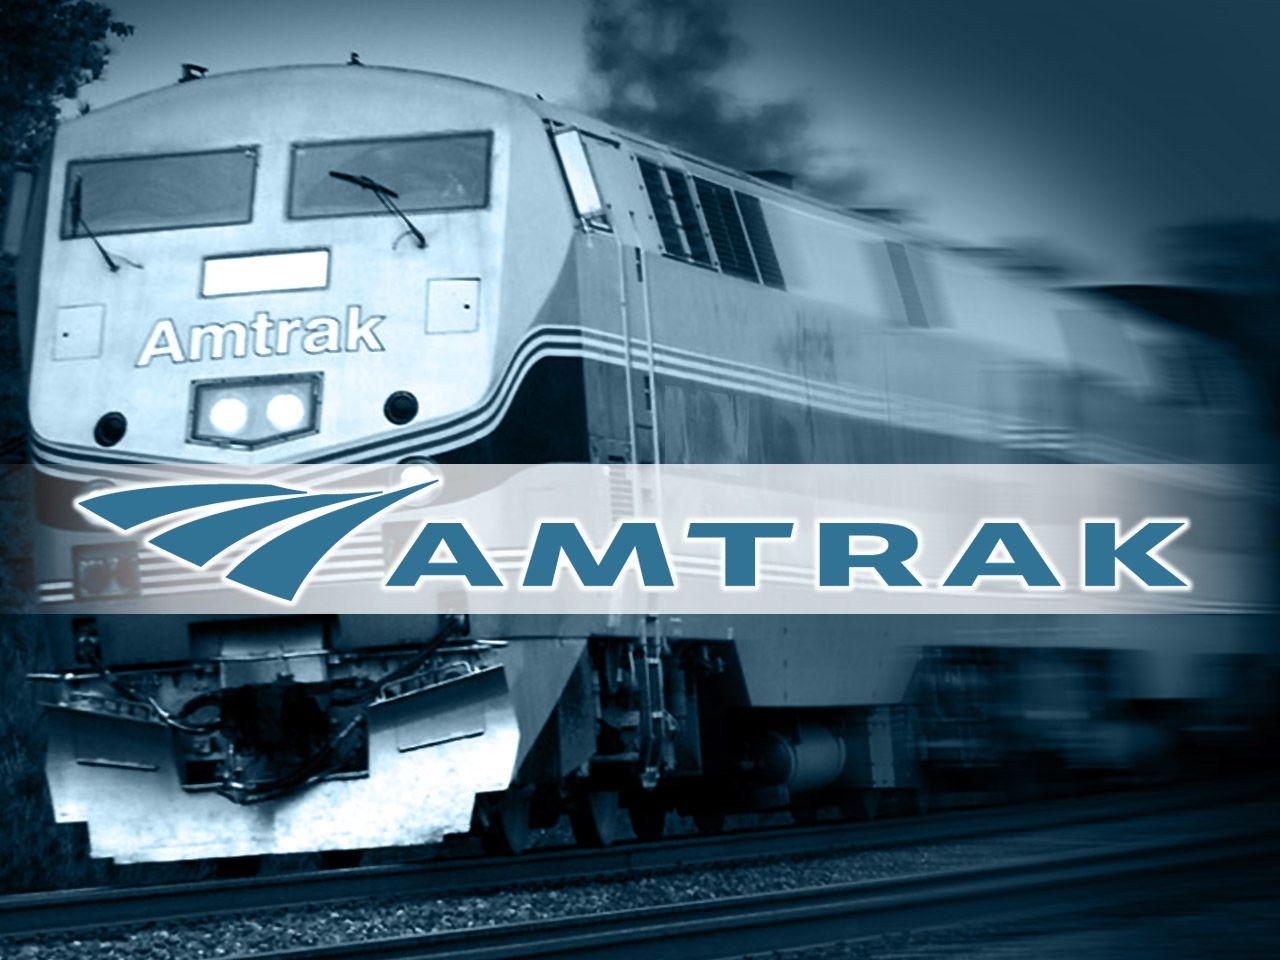 Amtrak Amtrak, Train companies, Train